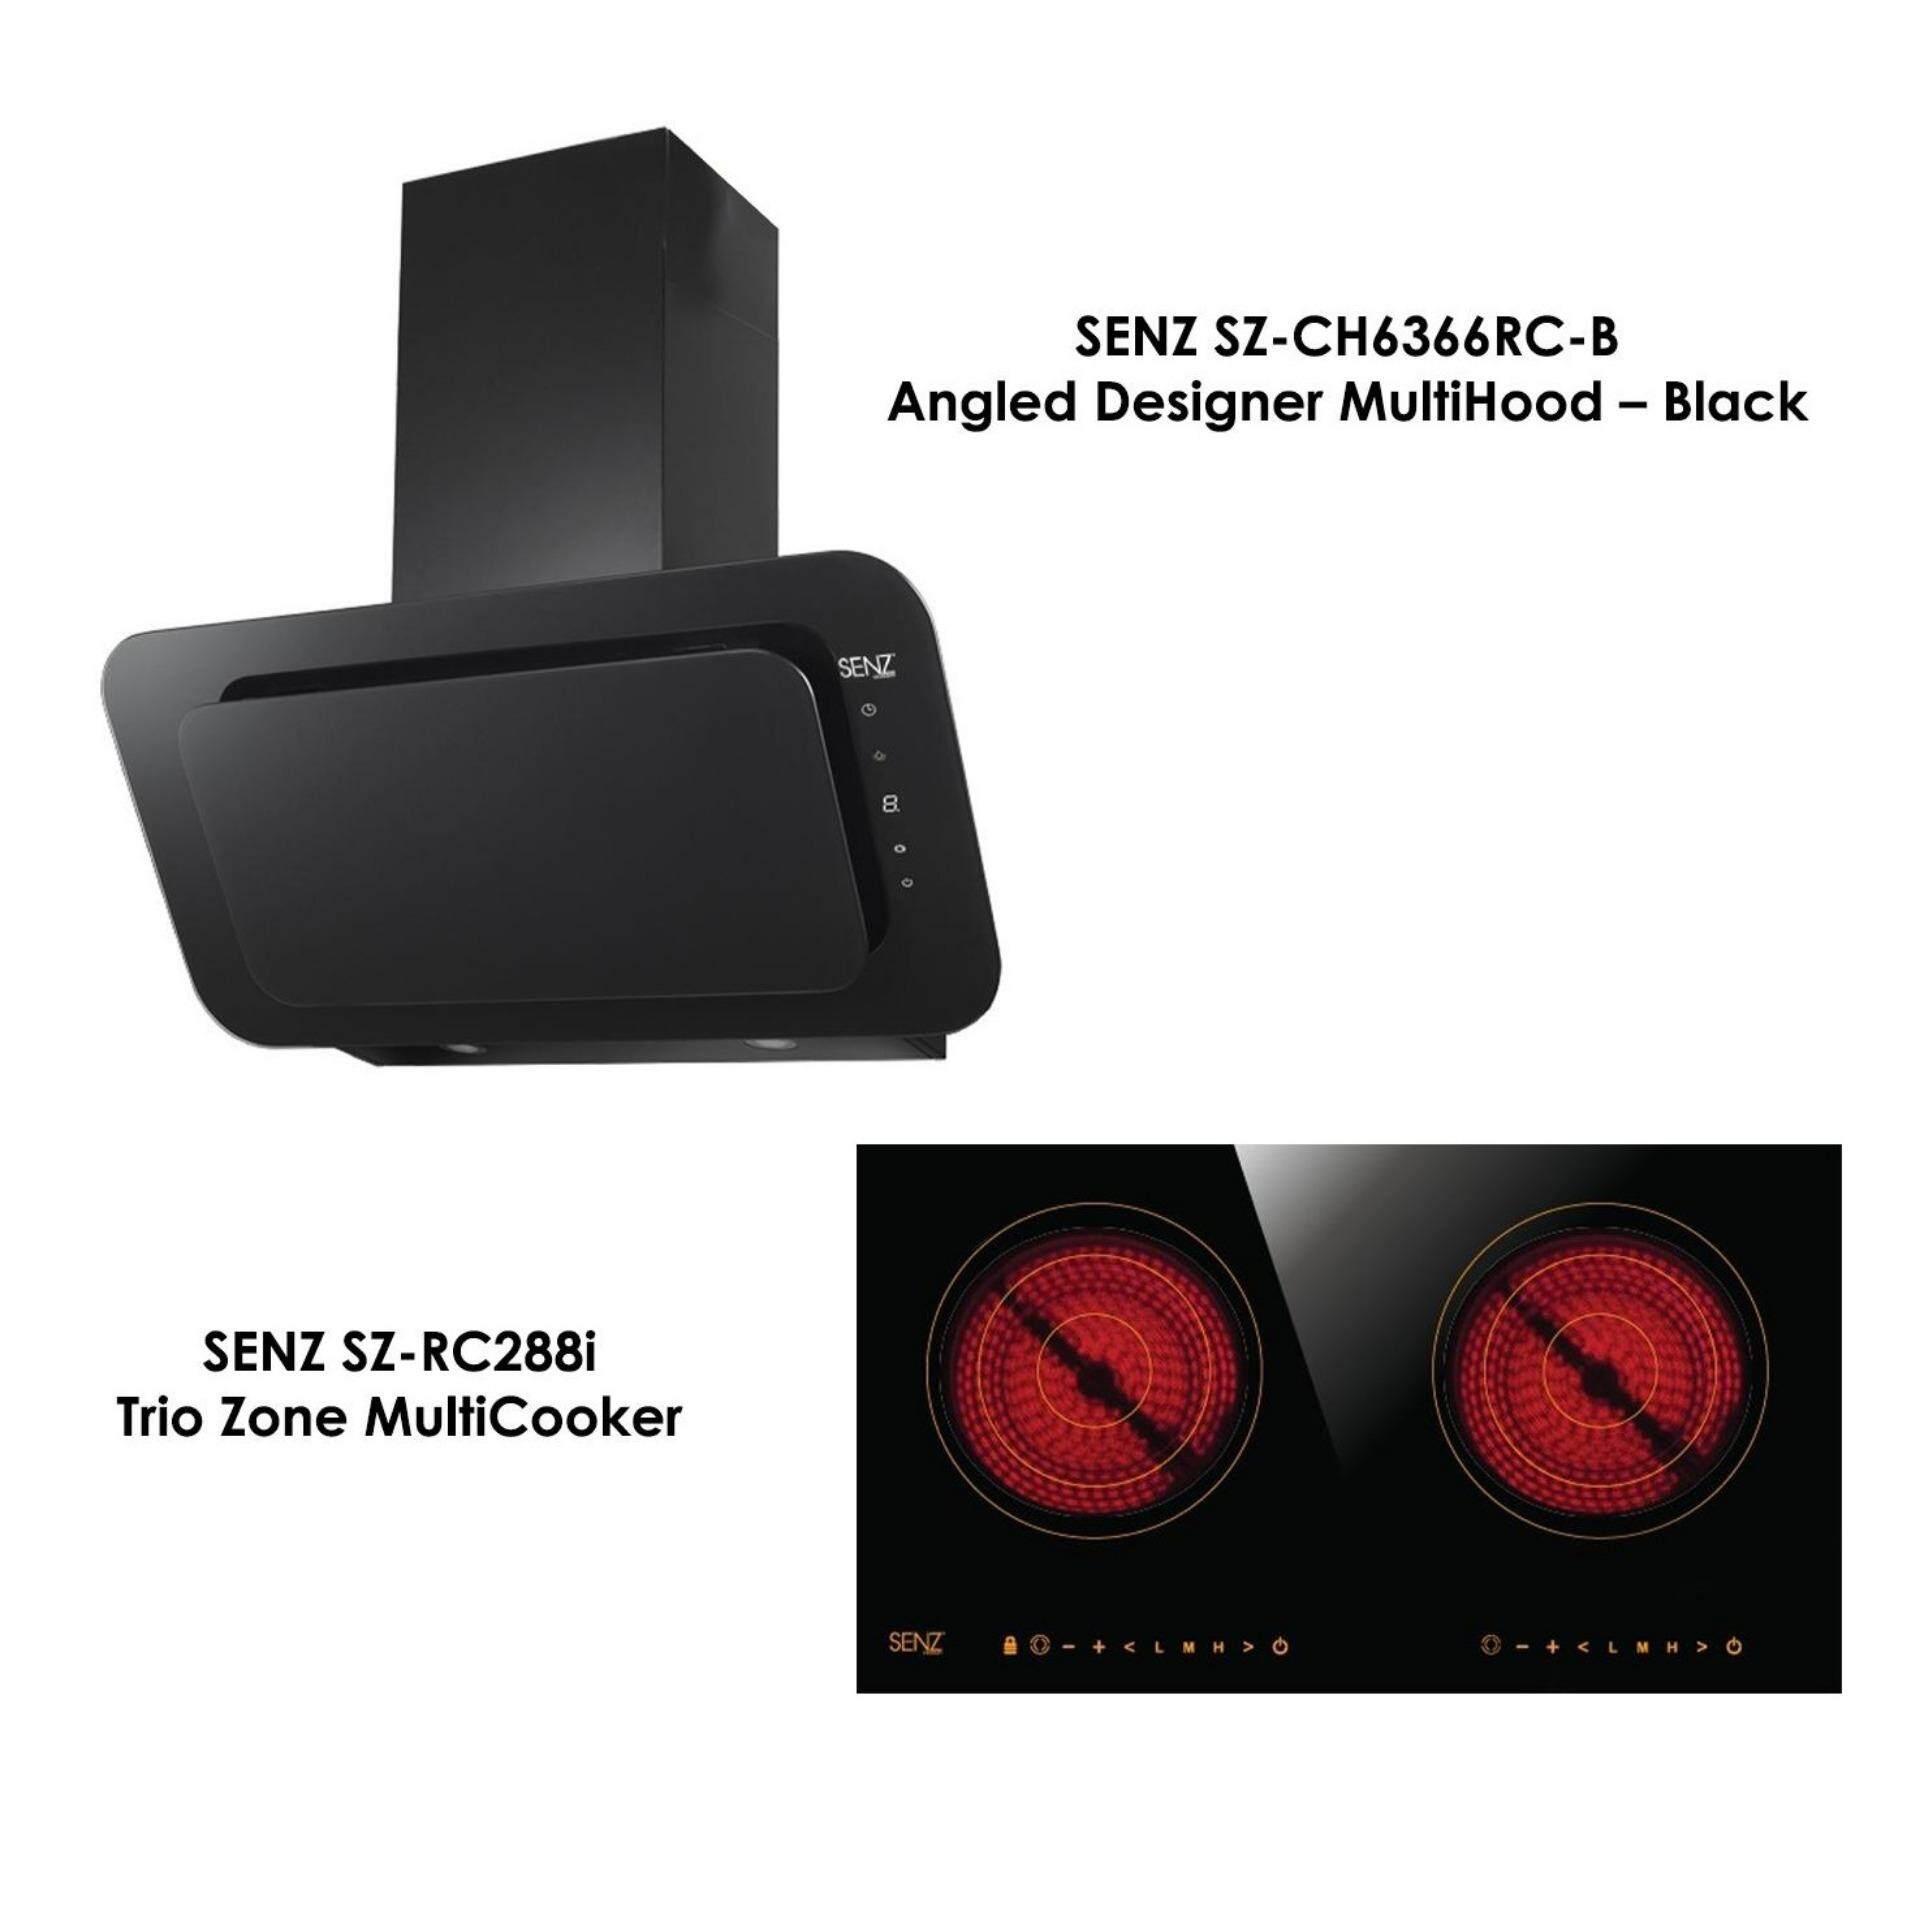 SENZ SZ-CH6366RC-B Angled Designer MultiHood 1300 m3/h Black + SENZ SZ-RC288I Trio Zone MultiCooker